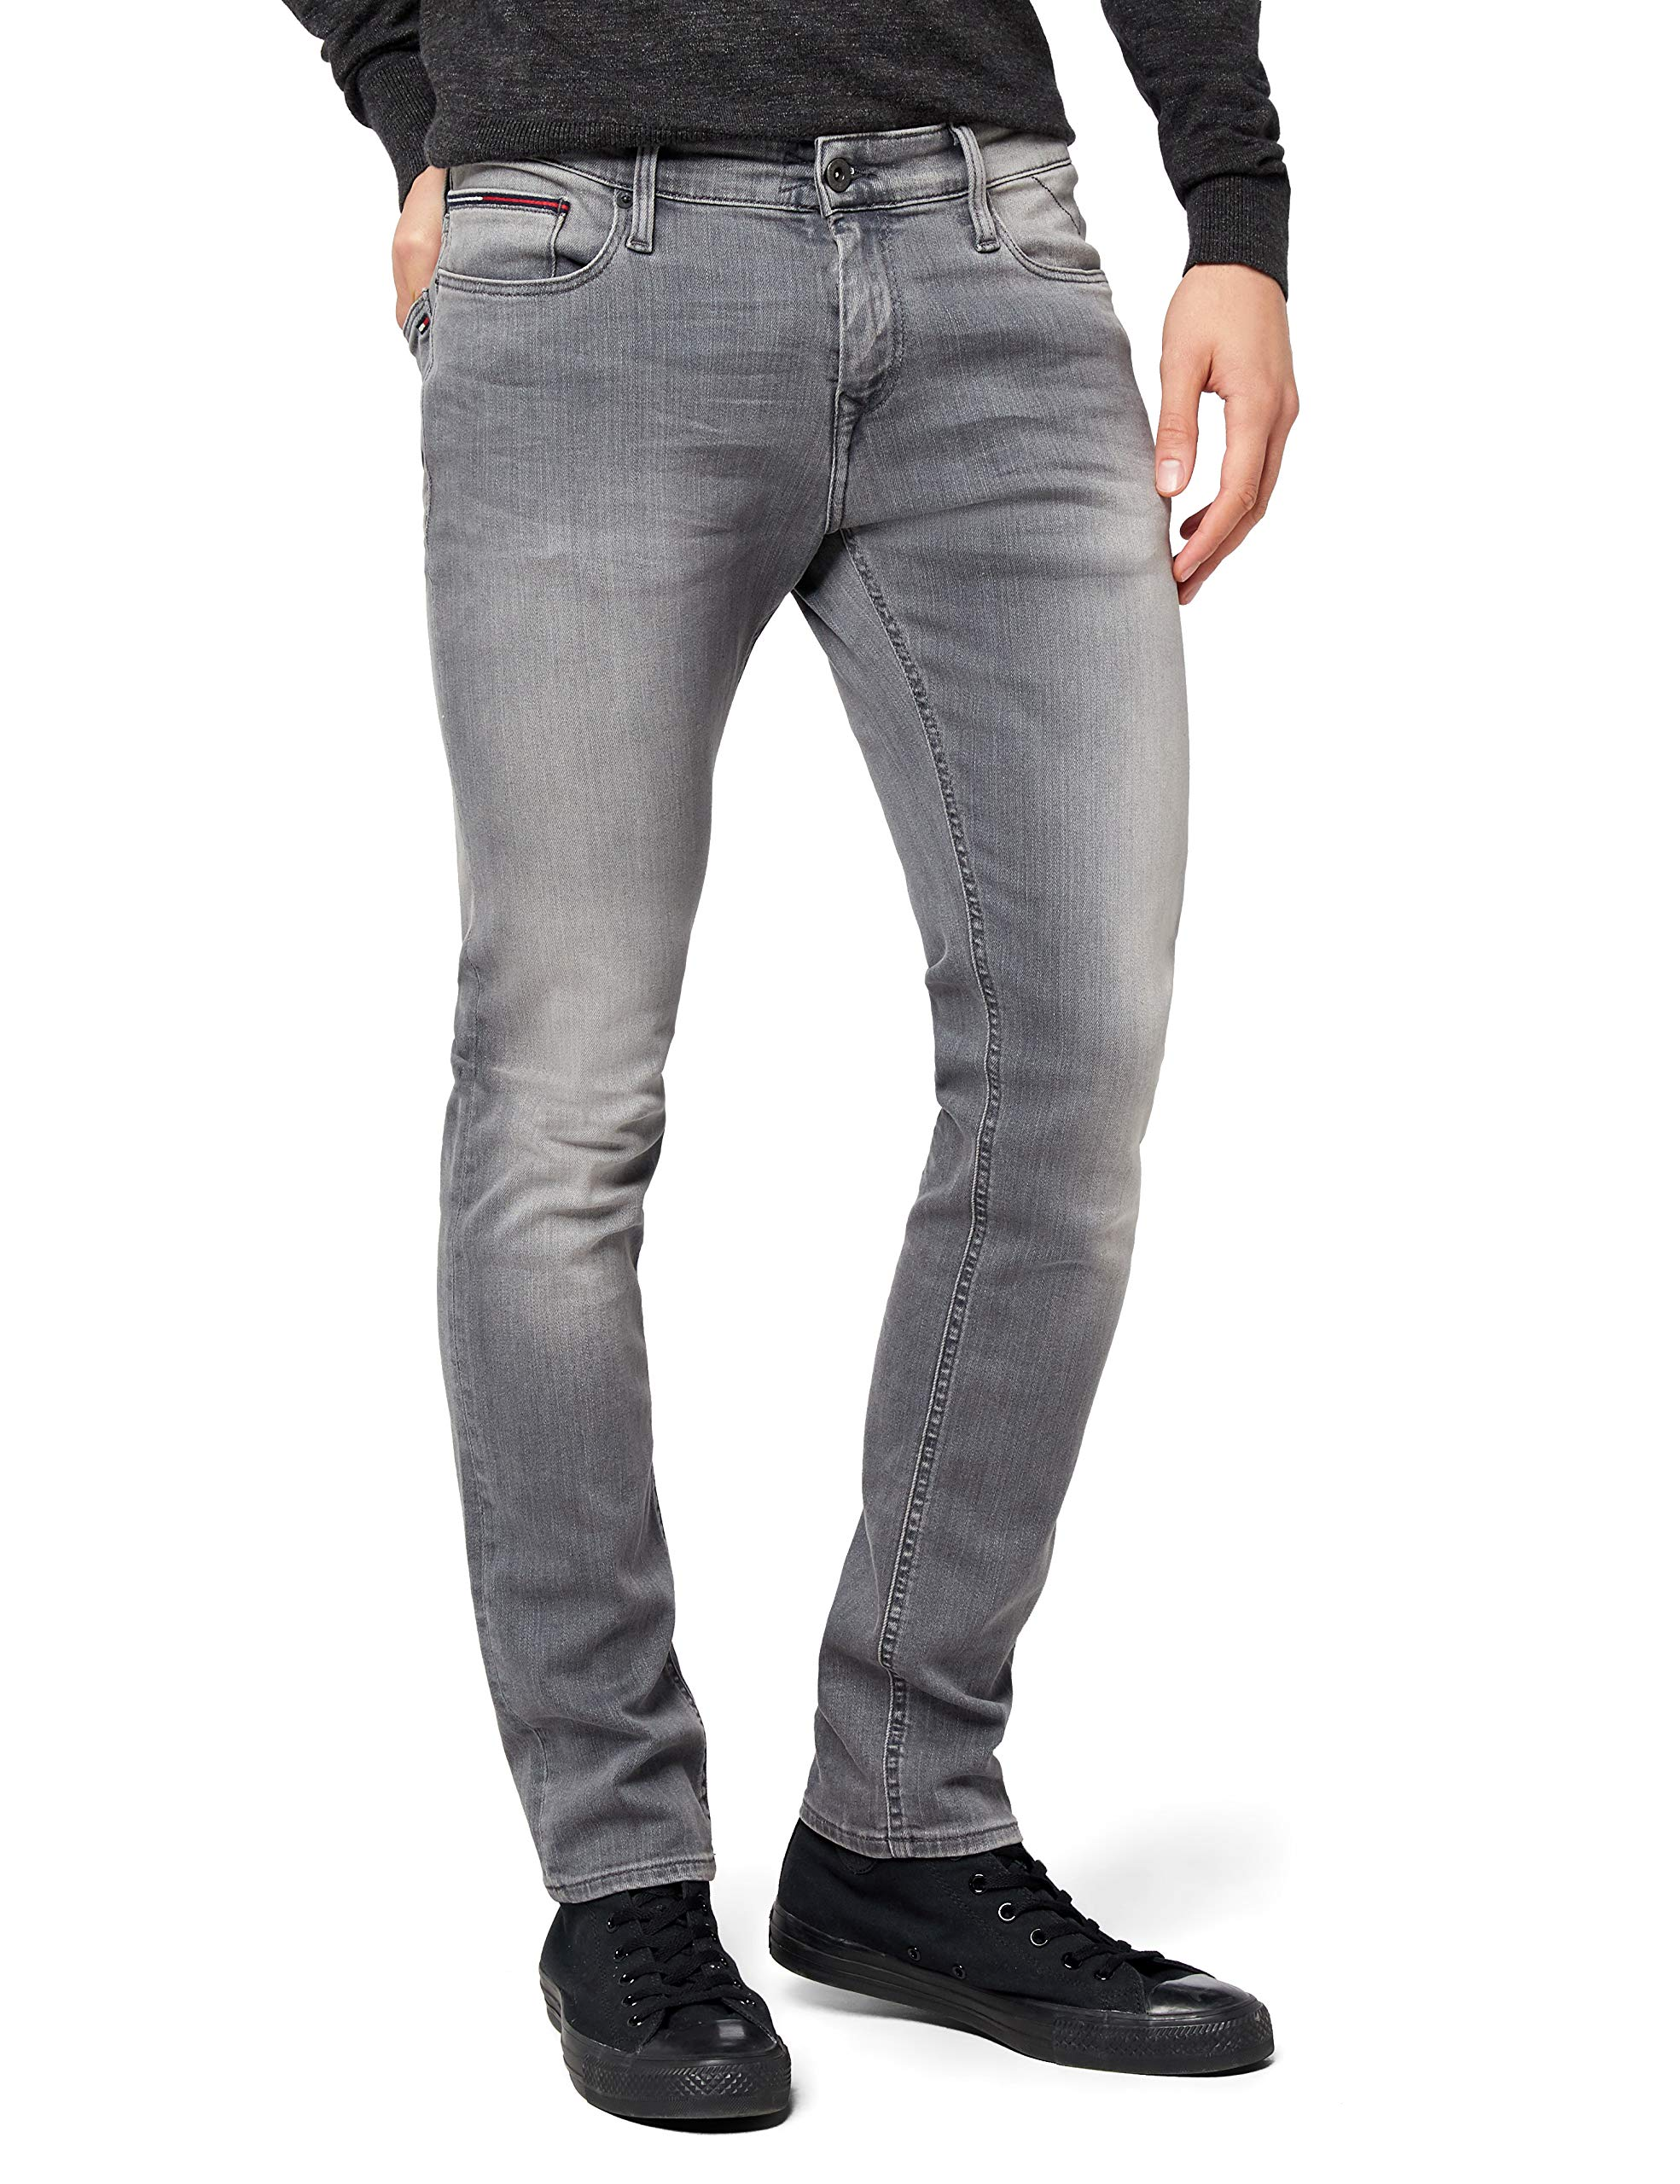 Tommy GrcoHommeGrisW30 Jeans Denim l34 Skinny Hilfiger Sidney dxsQrCthB